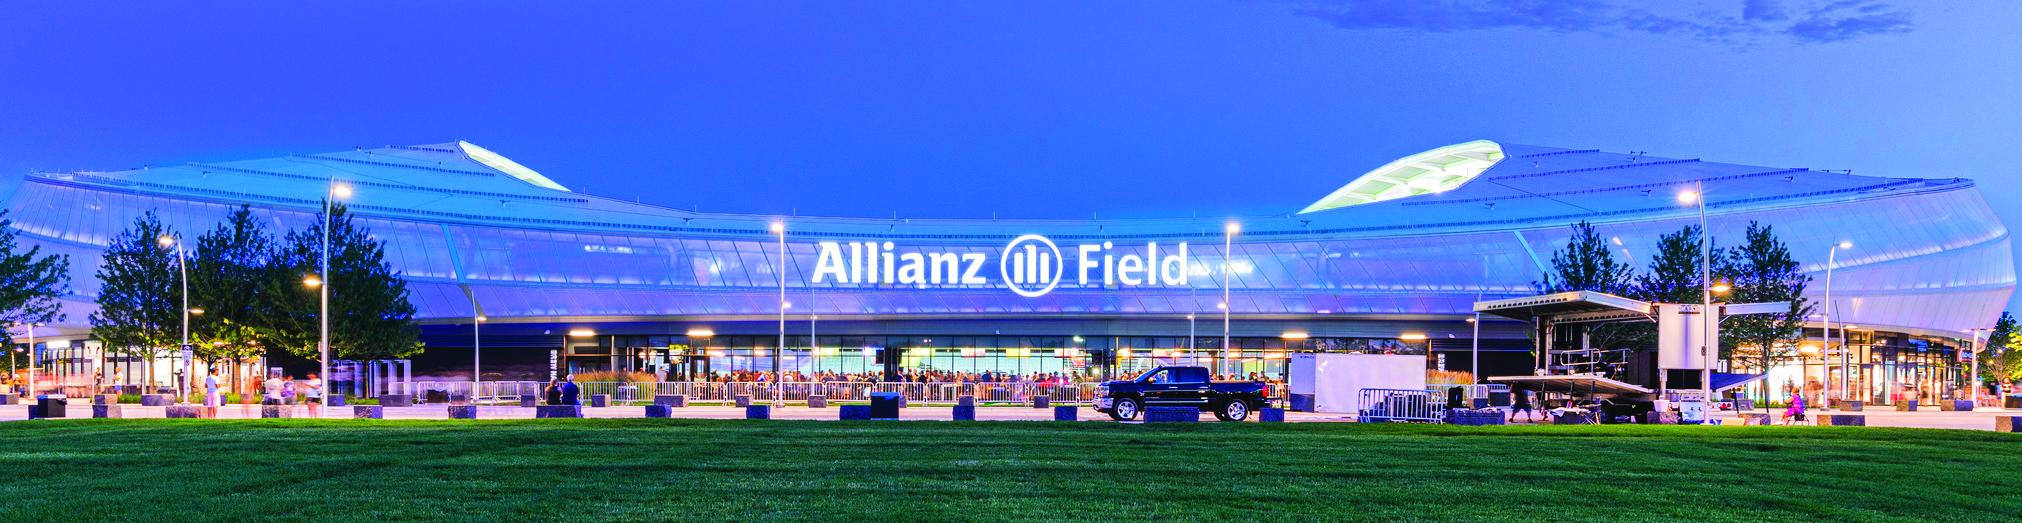 Allianz Field project photo